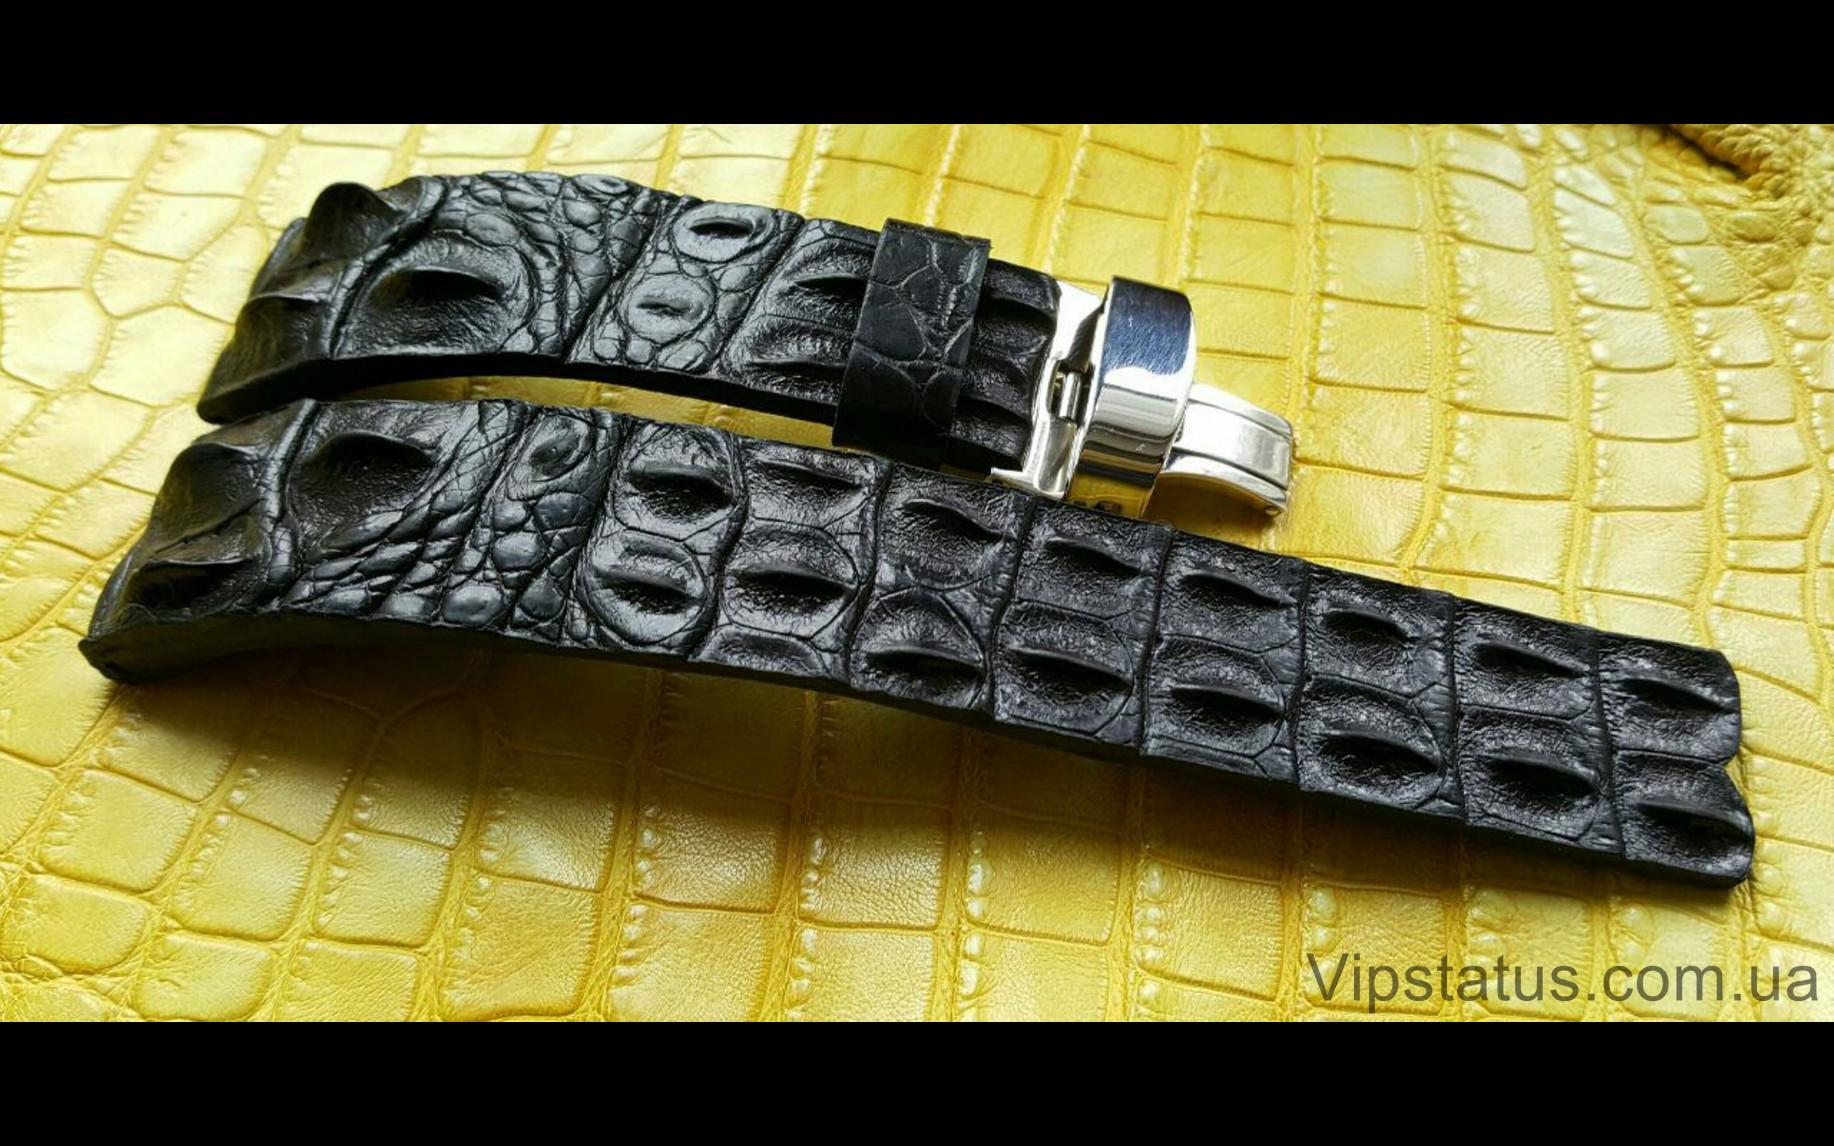 Elite Вип ремешок для часов Longines кожа крокодила Vip Crocodile Strap for Longines watches image 2